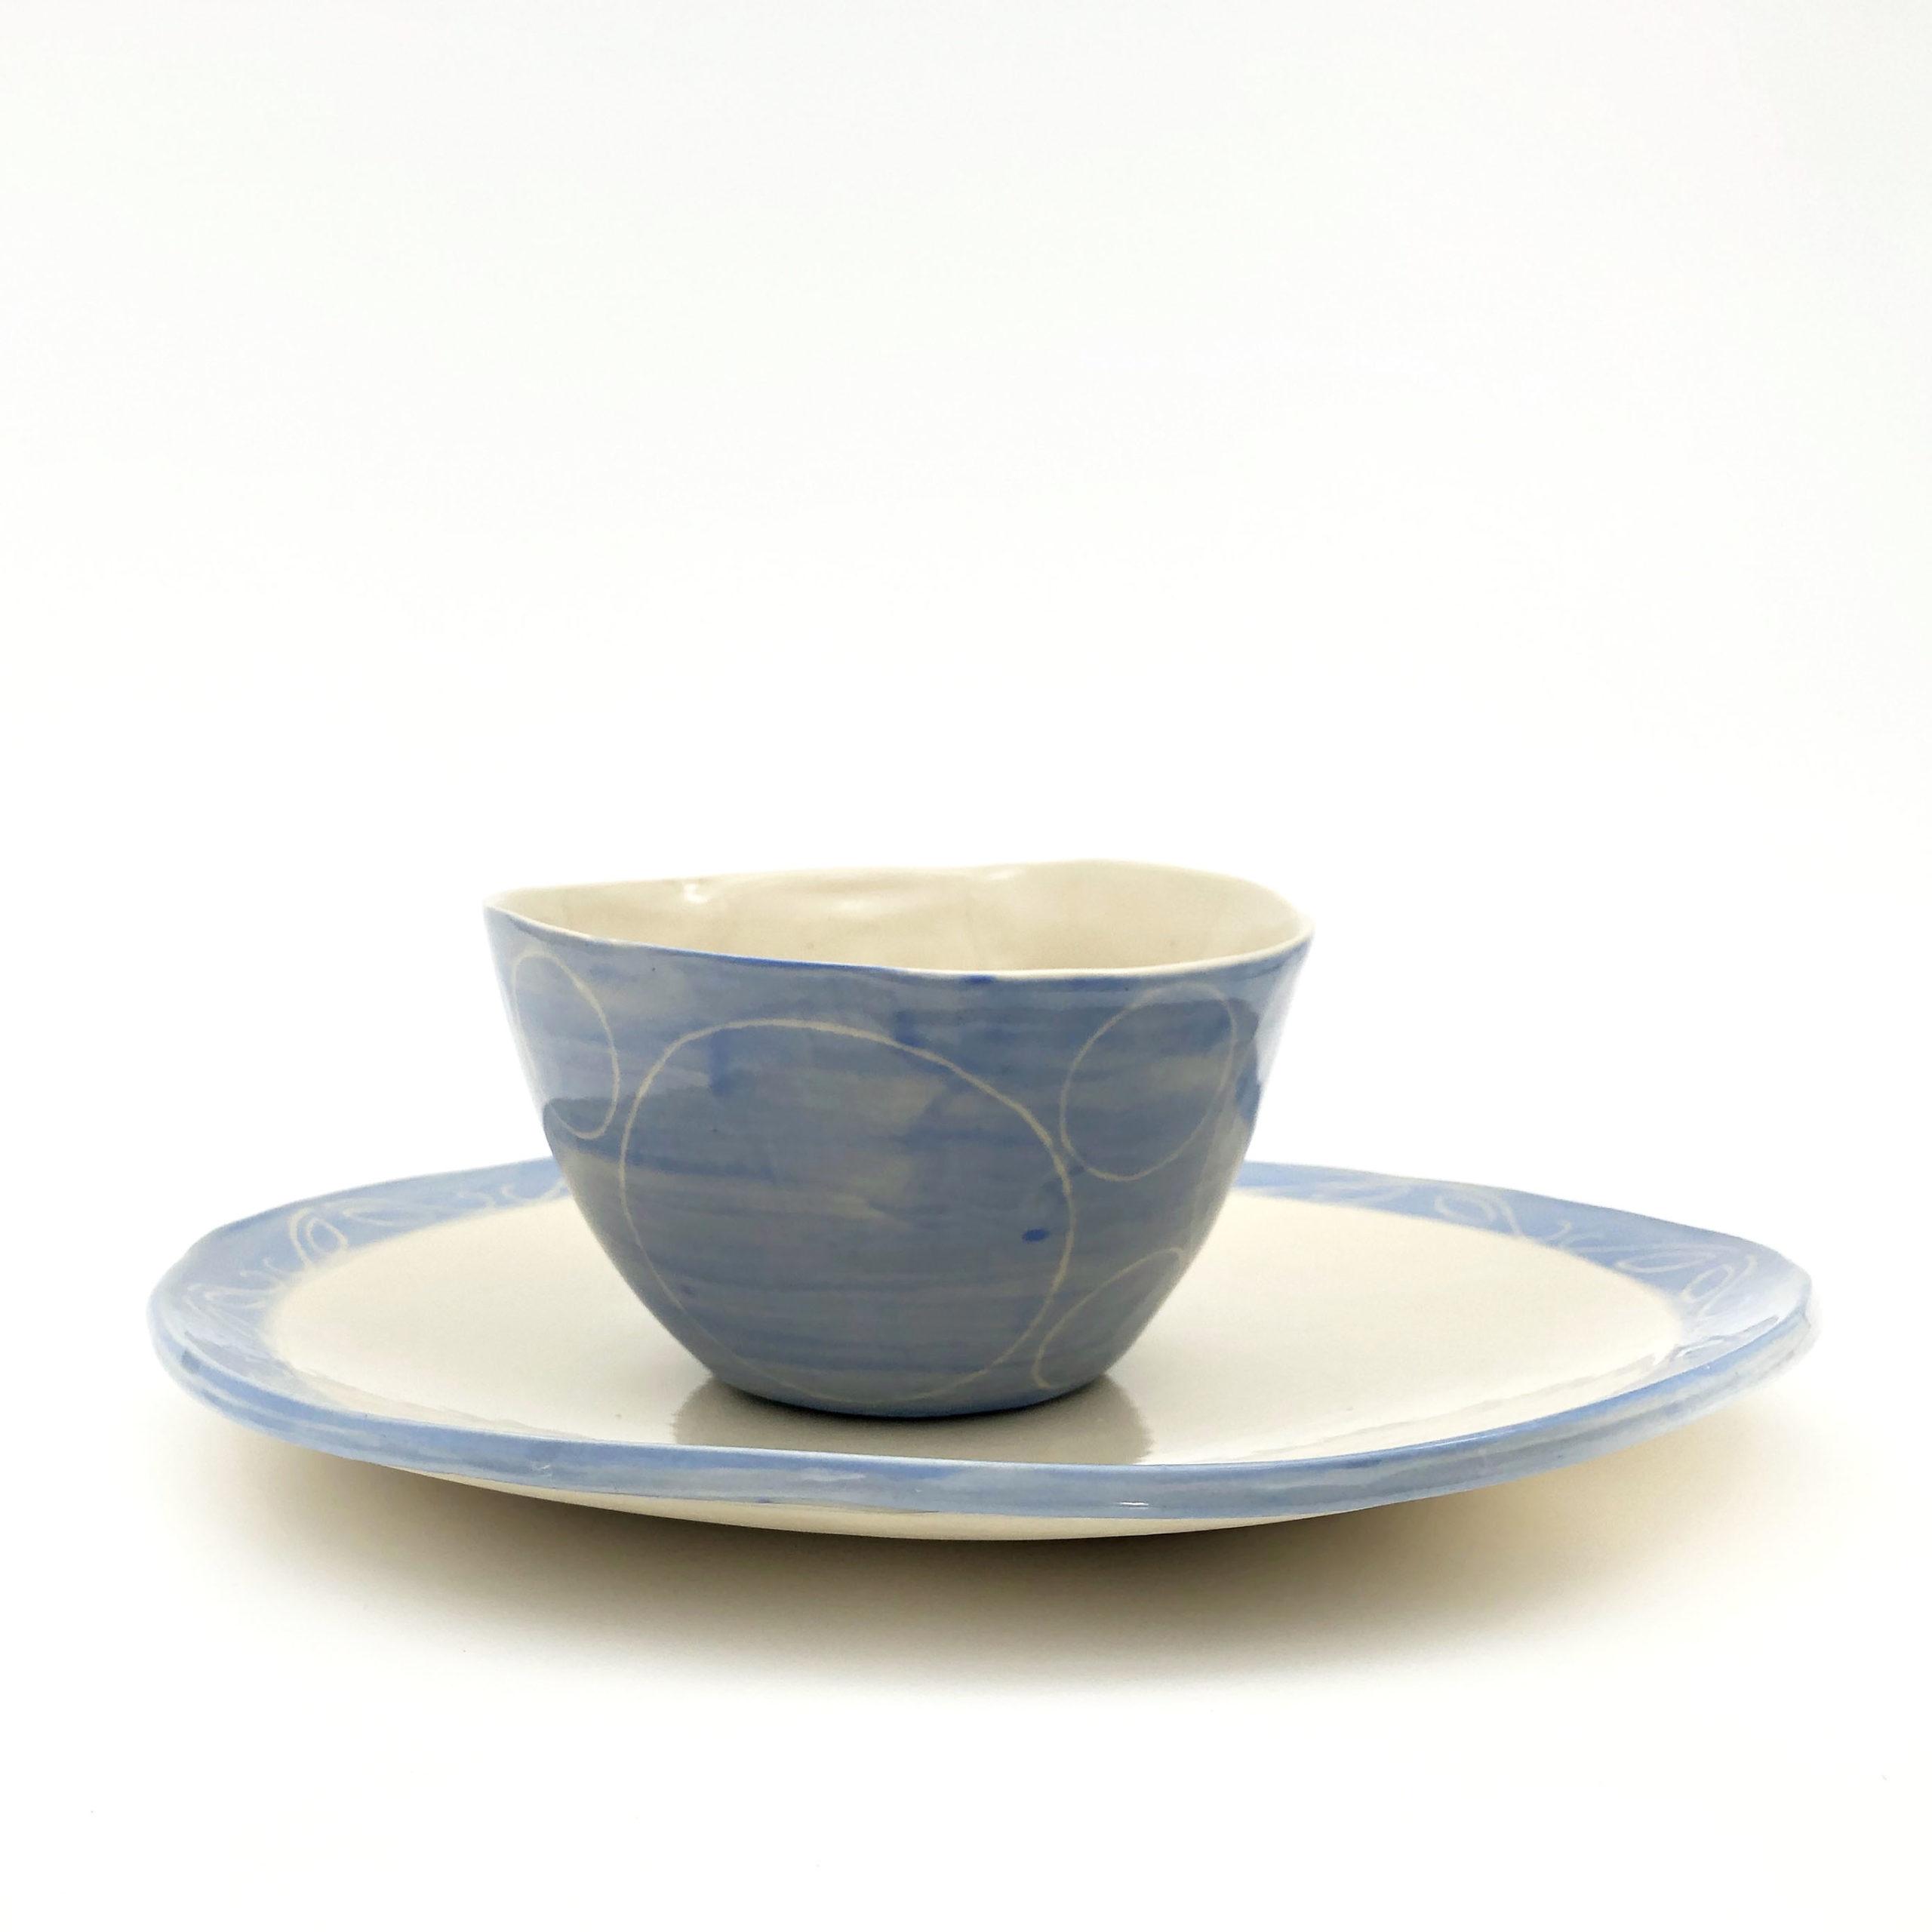 Sabah bowl and plate